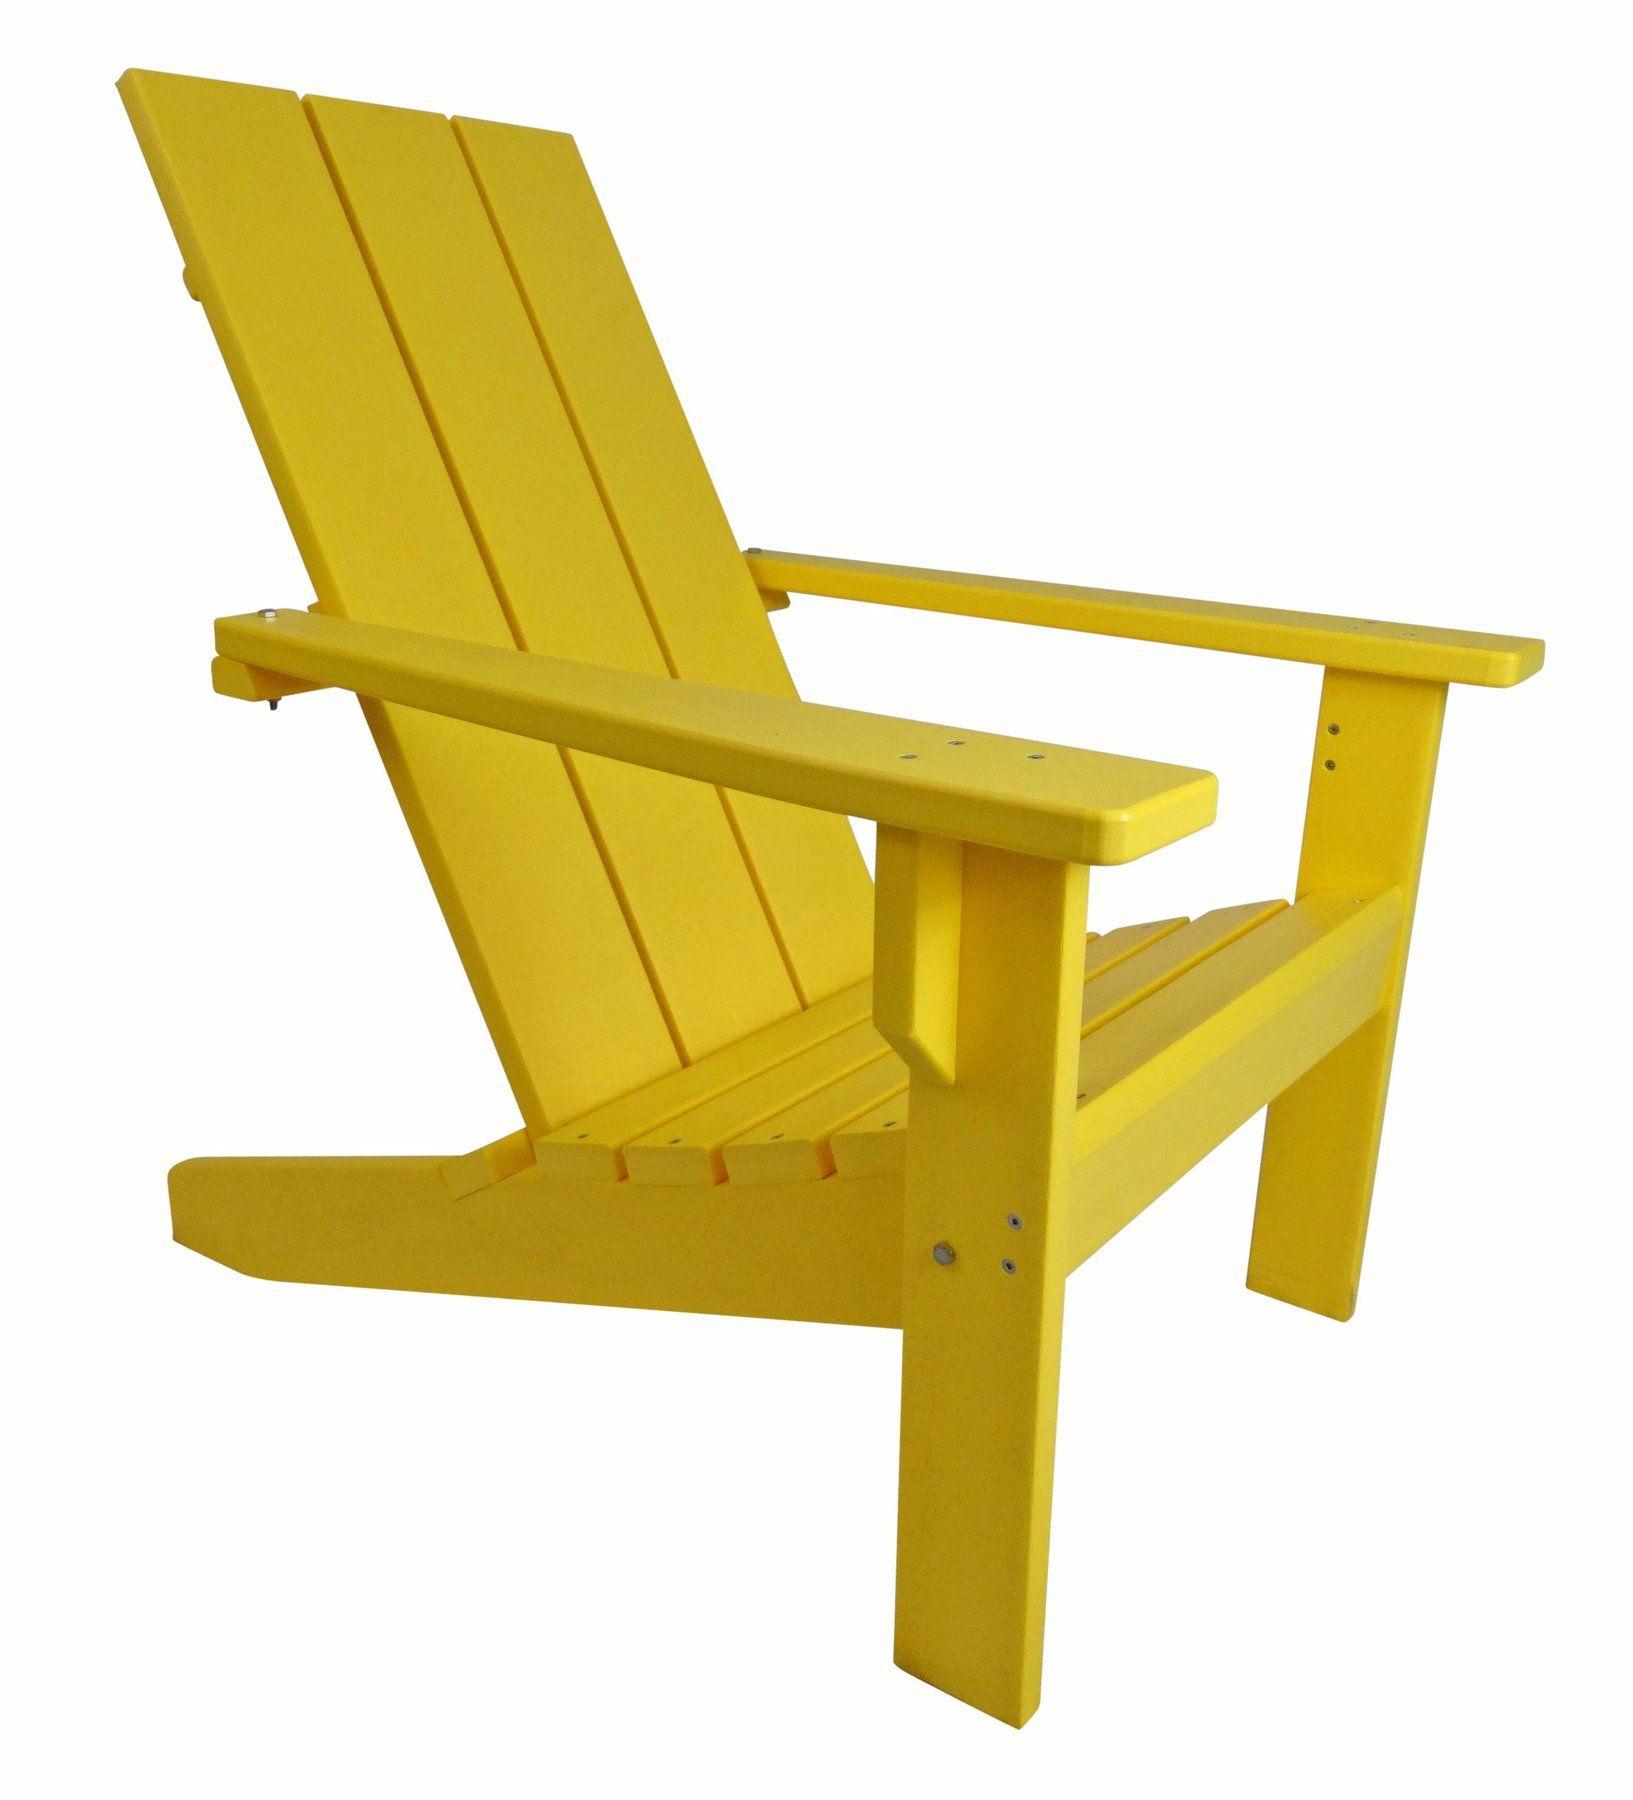 Modern Adirondack Chair Chair Modern Chairs Resin Adirondack